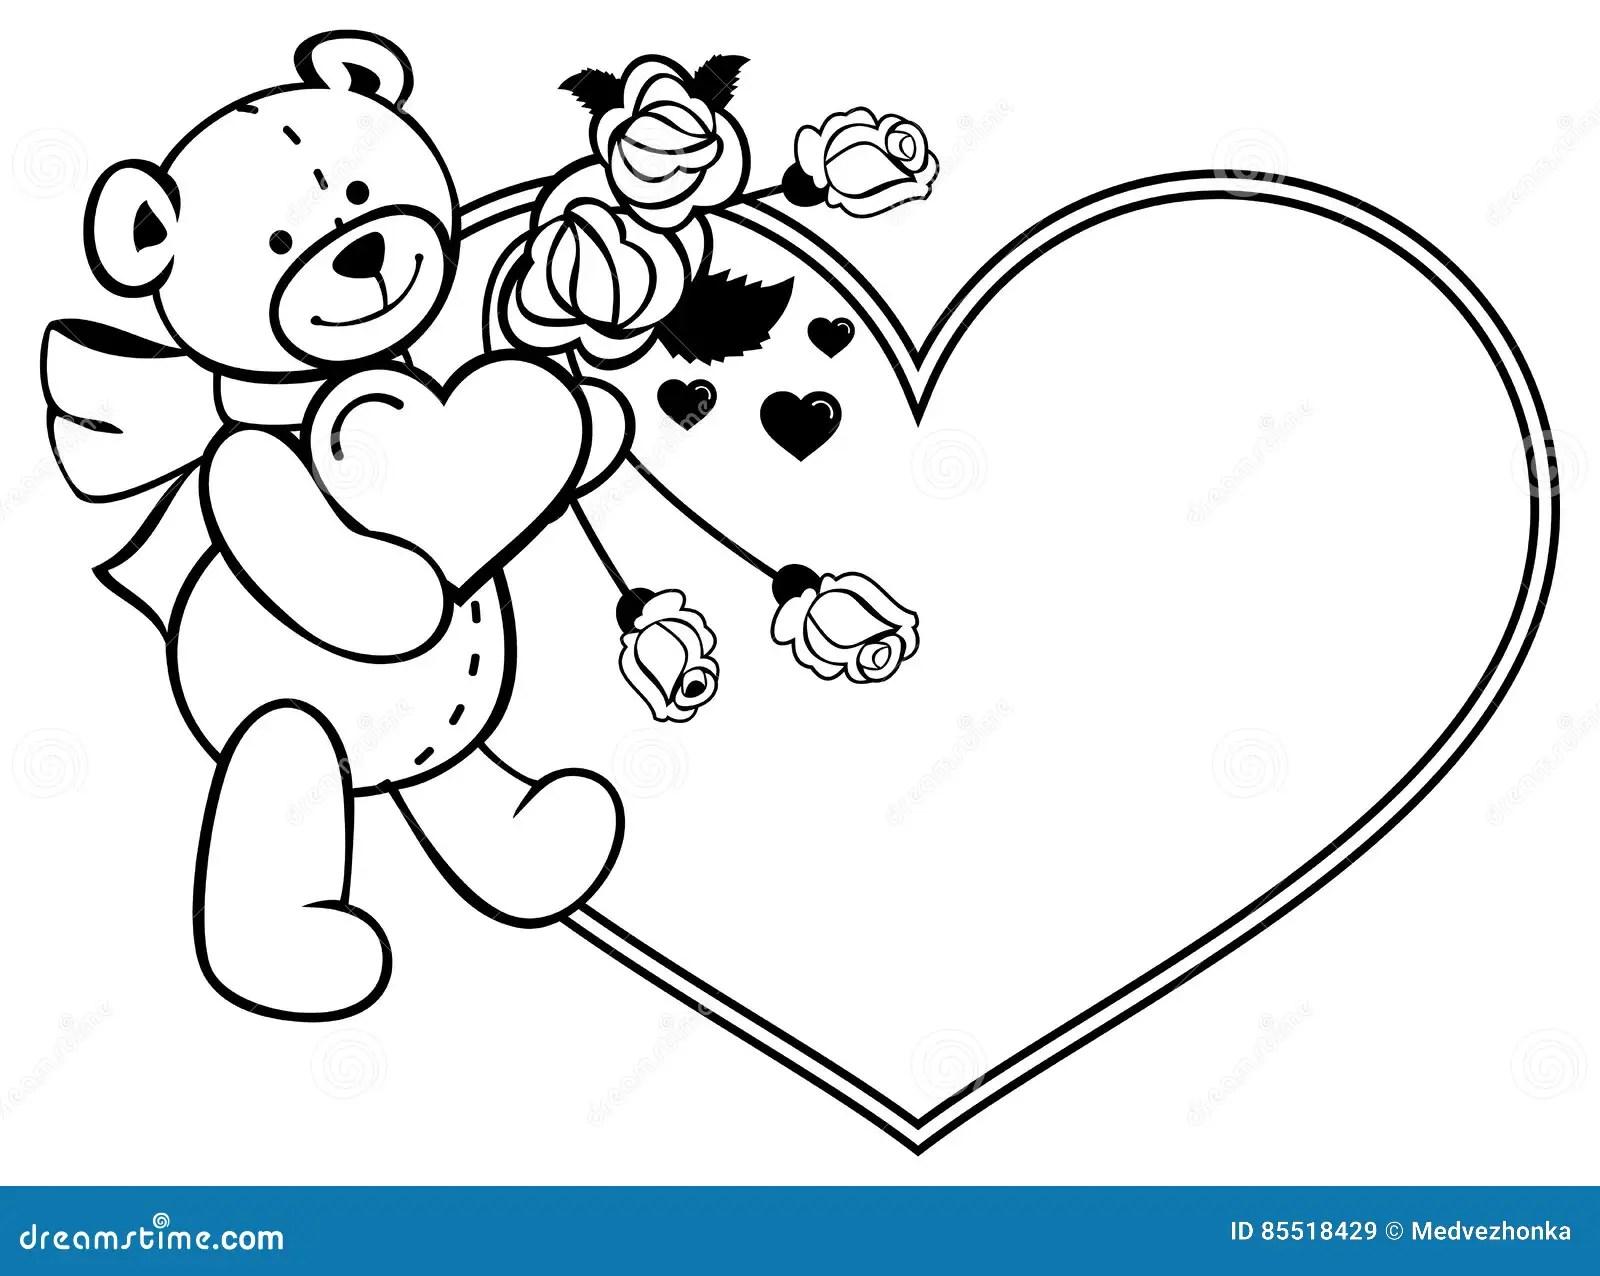 Heart Shaped Frame With Outline Roses Teddy Bear Holding Heart Stock Illustration